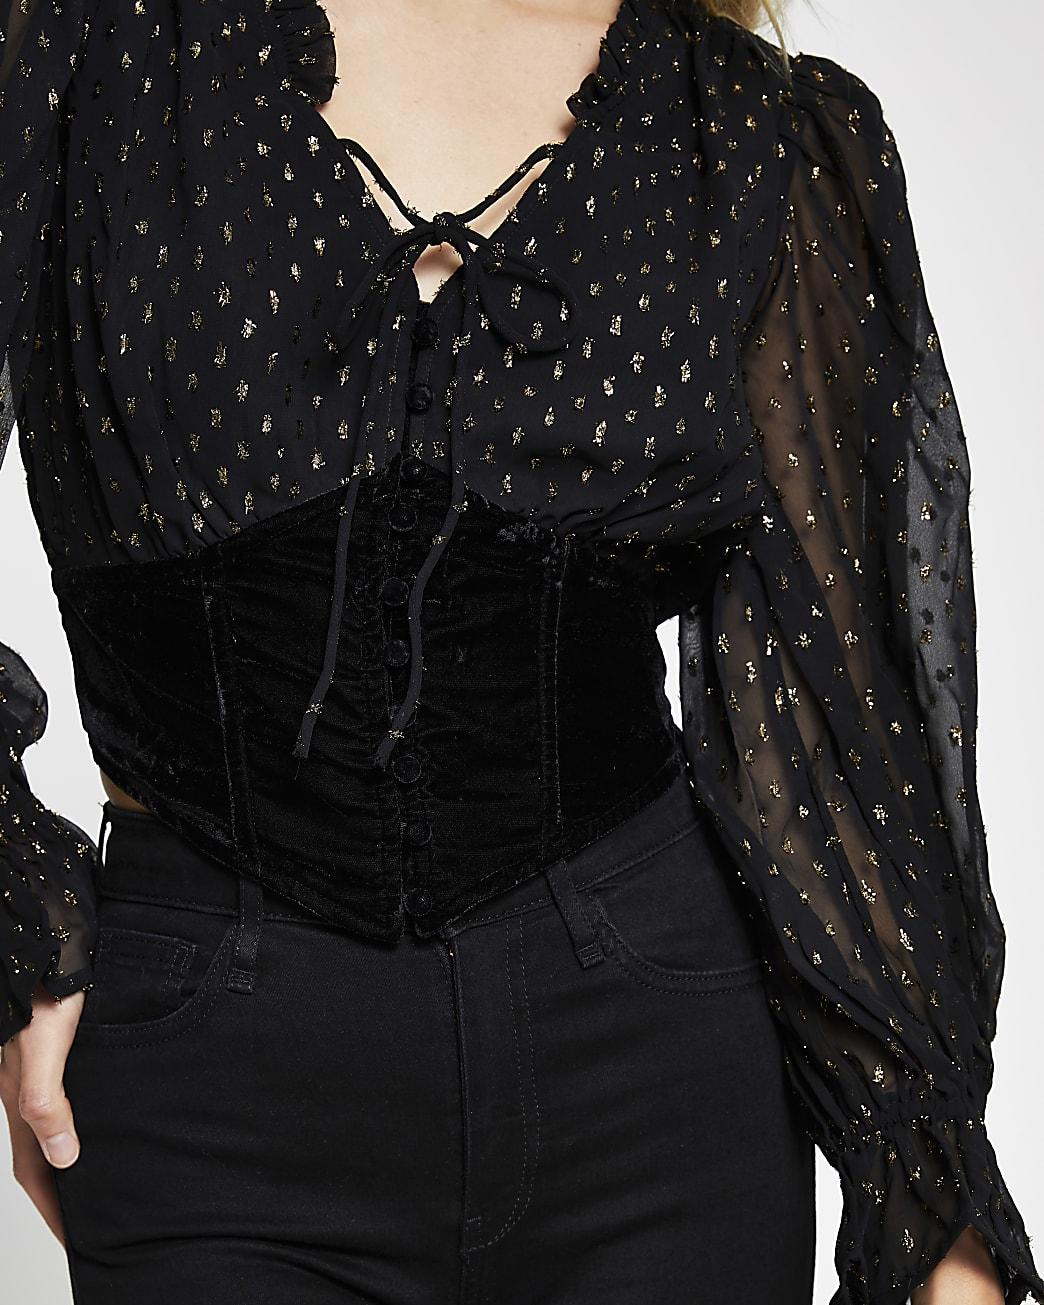 Black long sleeve corset lurex blouse top